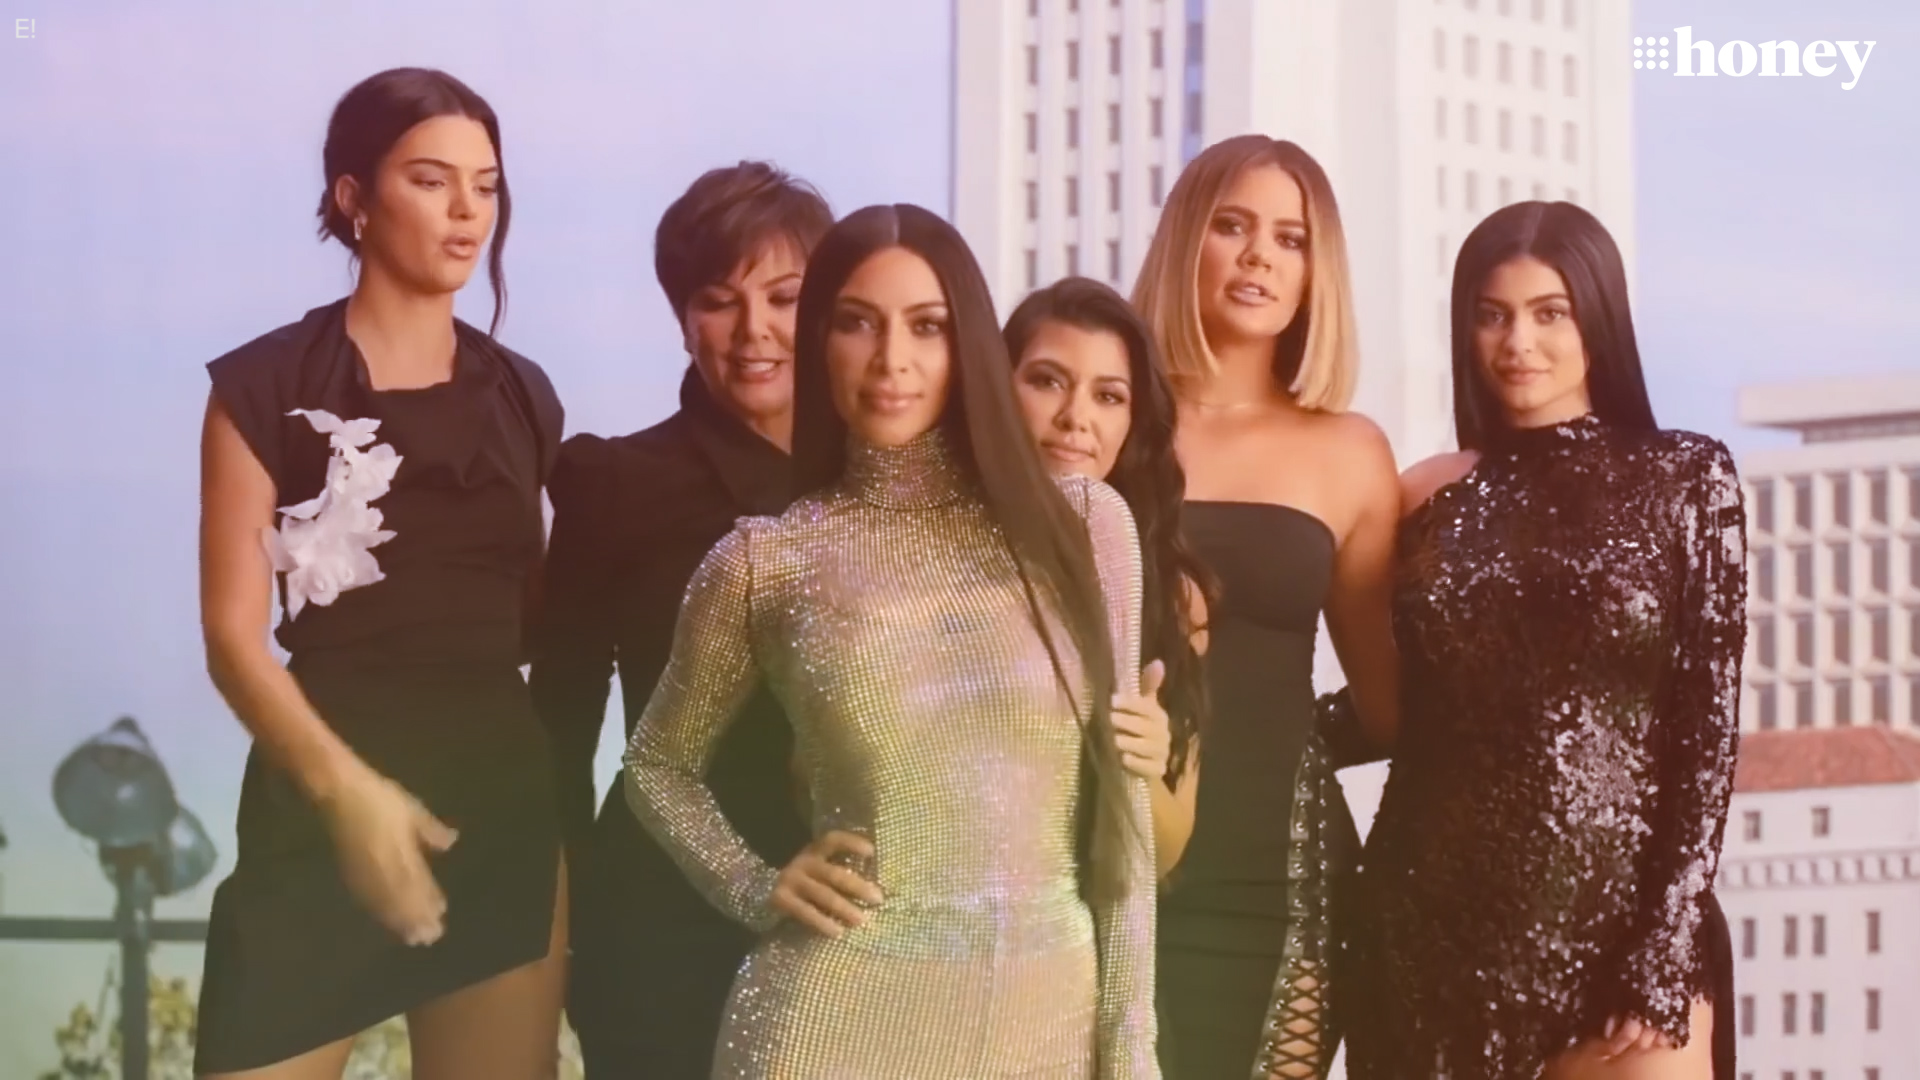 Inside the Kardashian empire